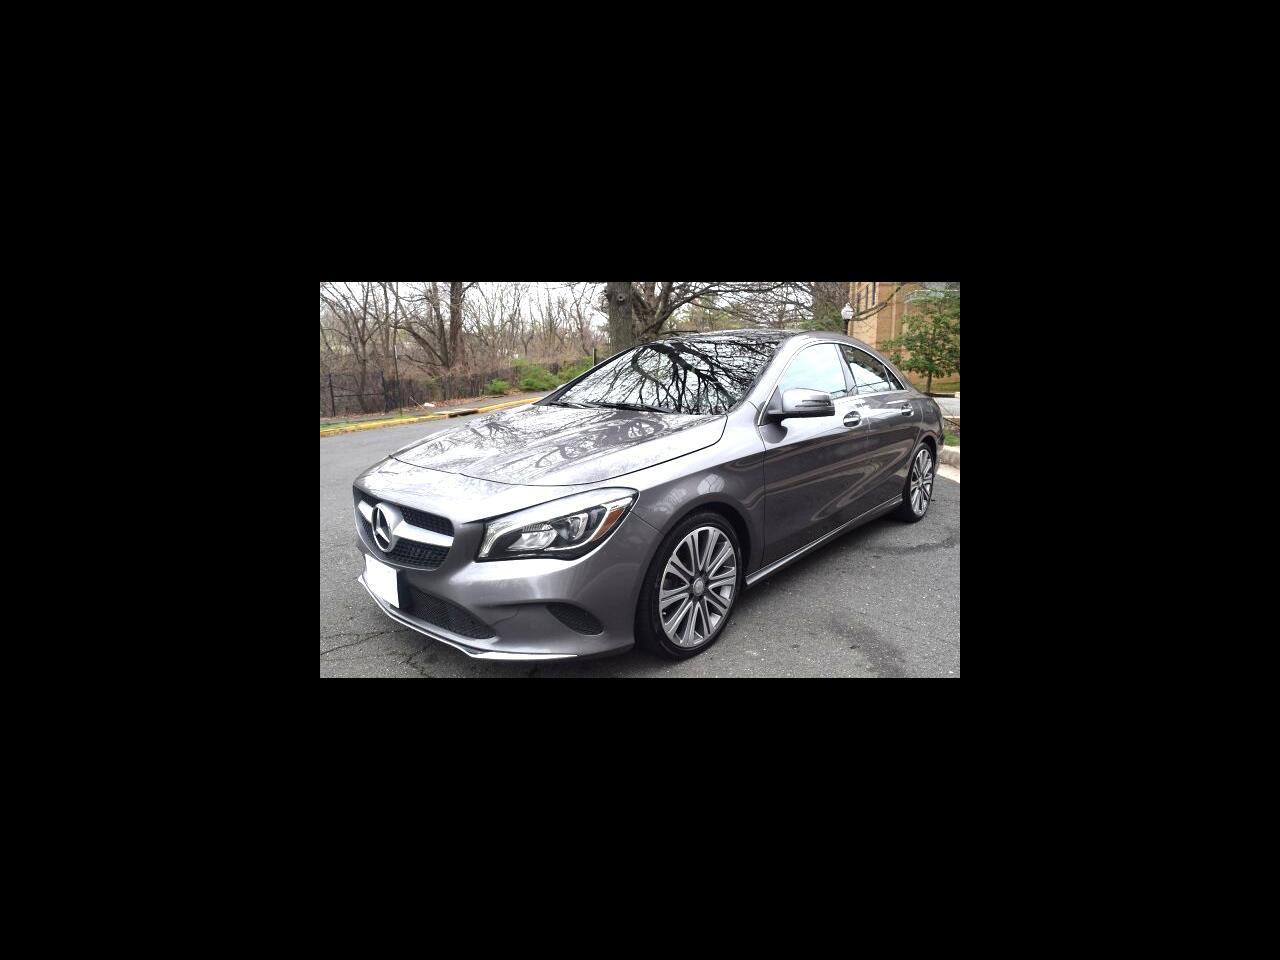 Mercedes-Benz CLA CLA 250 4MATIC Coupe 2018